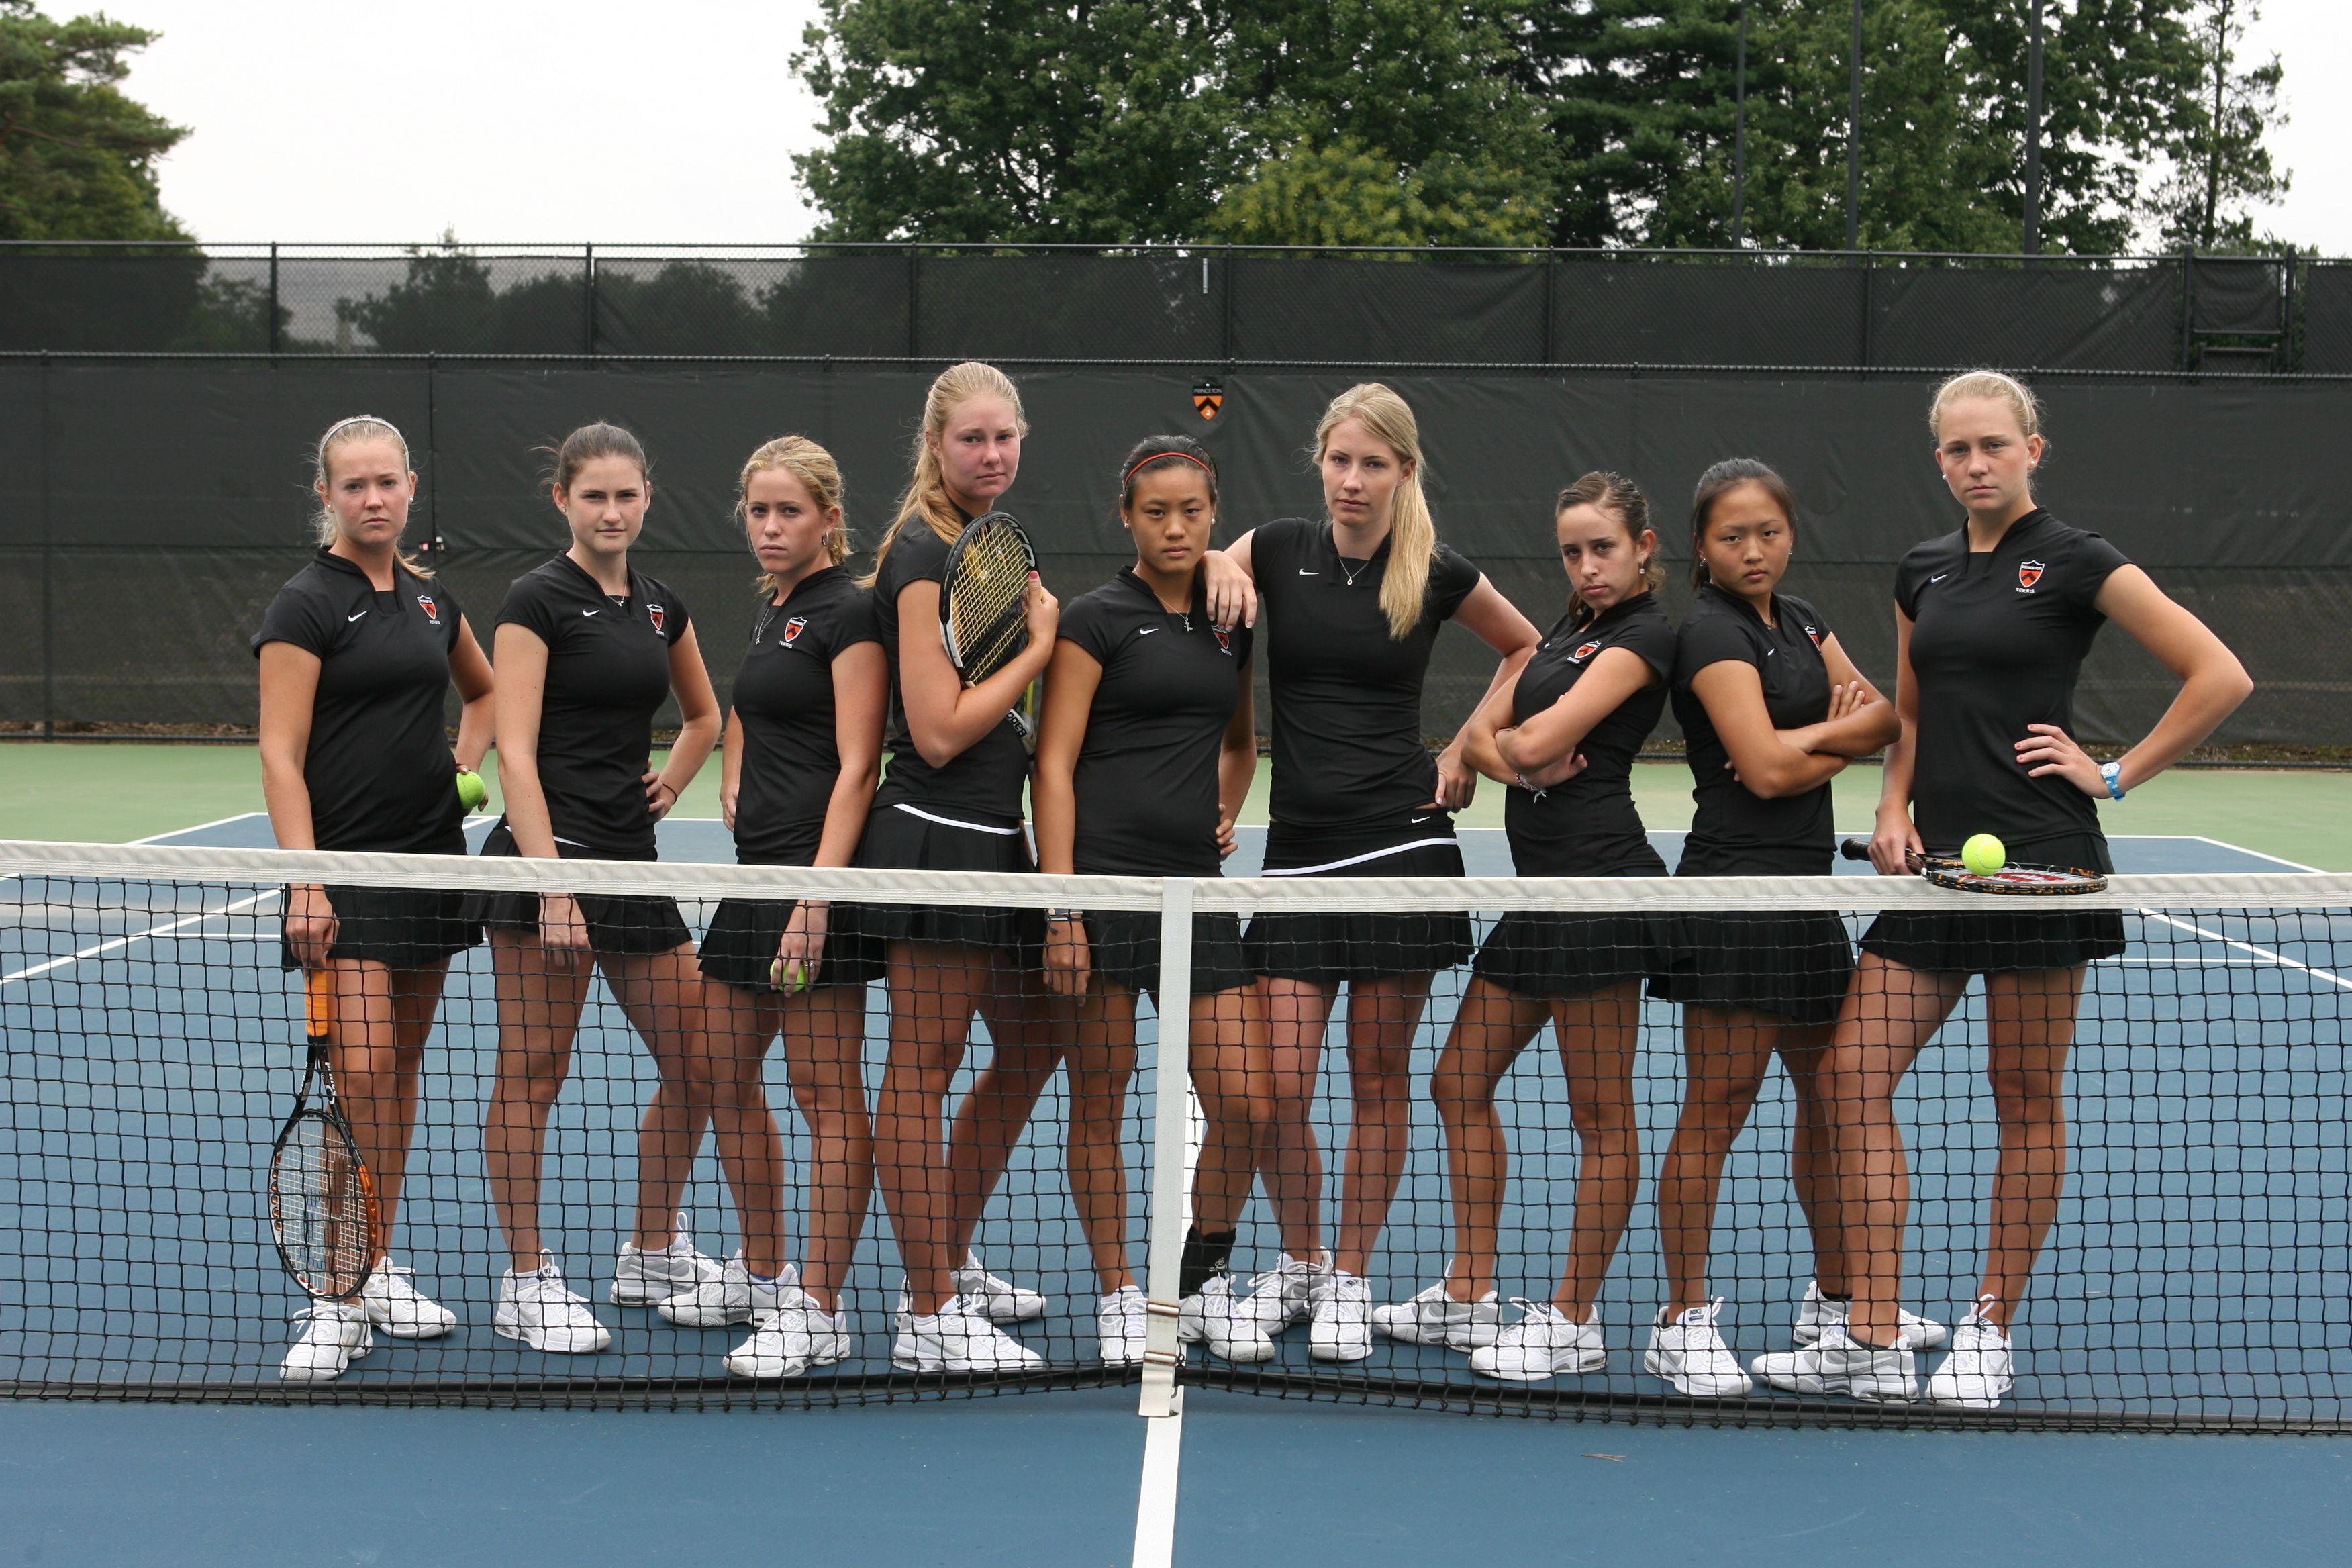 College Tennis Players College Tennis Online Ncaa Results Ita Collegiate Tennis Rankings Tennis Senior Pictures Tennis Pictures Tennis Photos